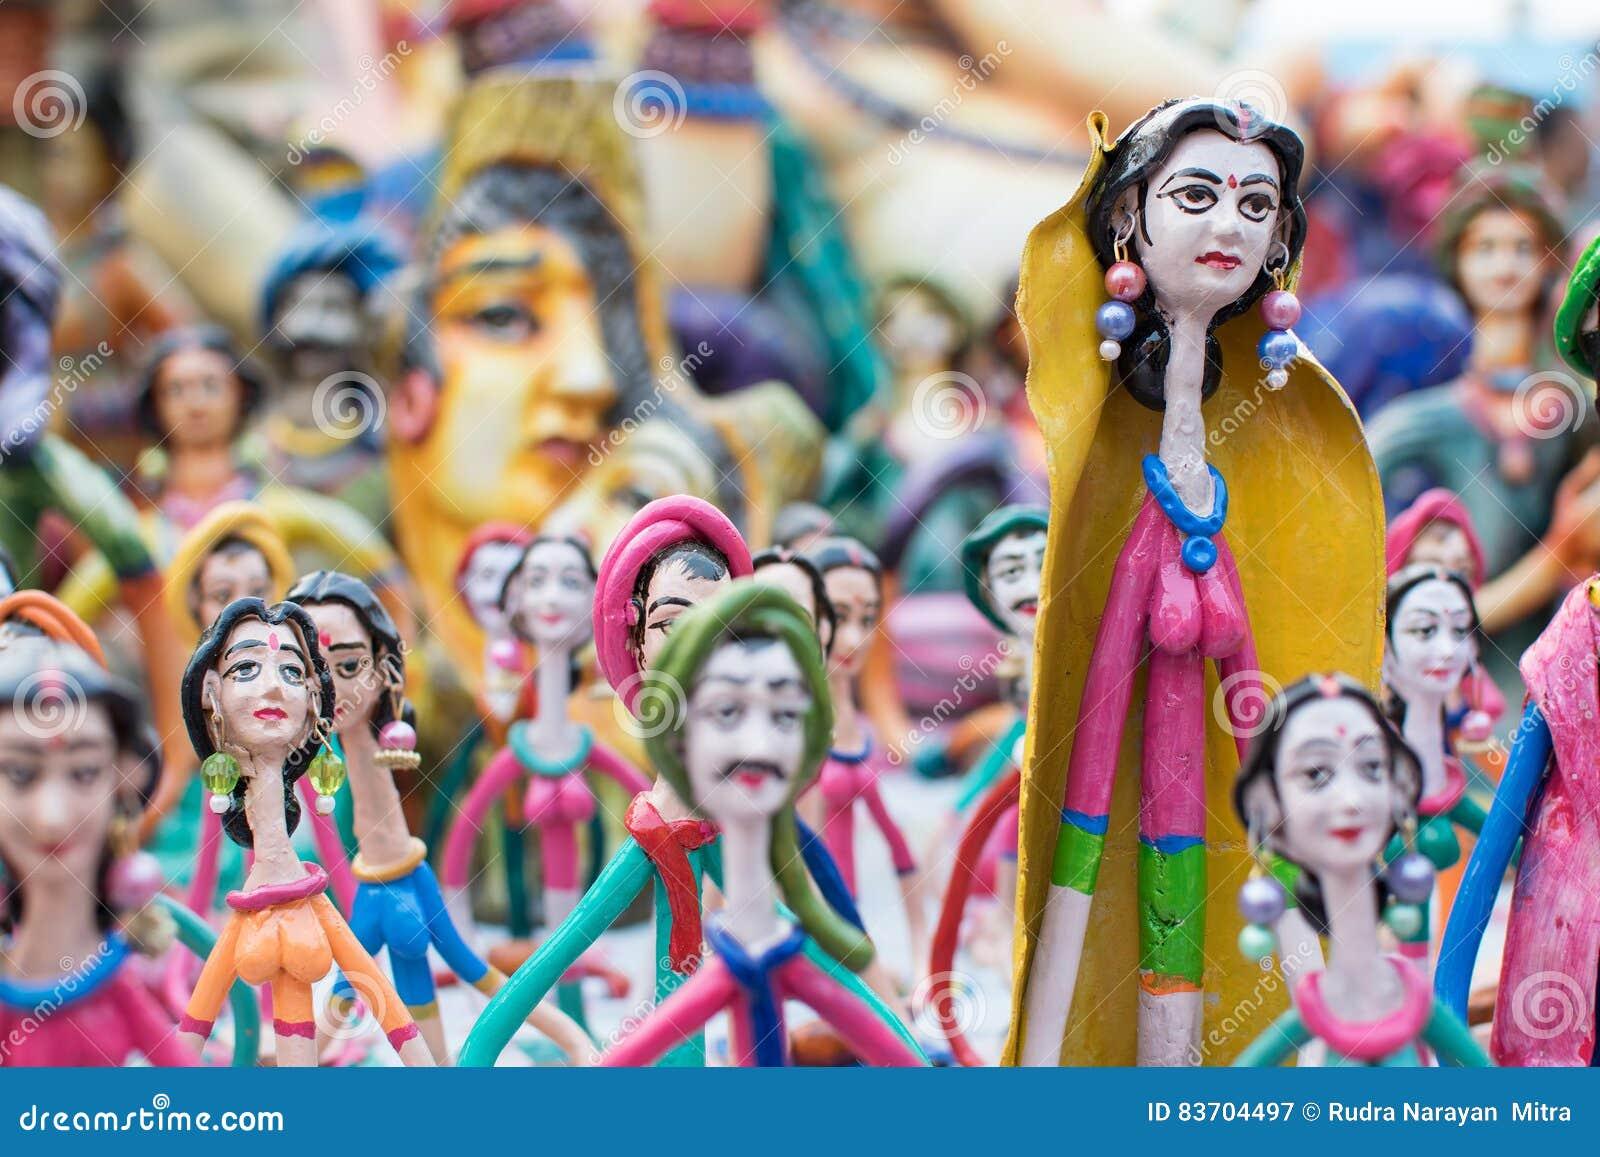 Clay Made Dolls , Handicraft Items On Display , Kolkata Stock Photo